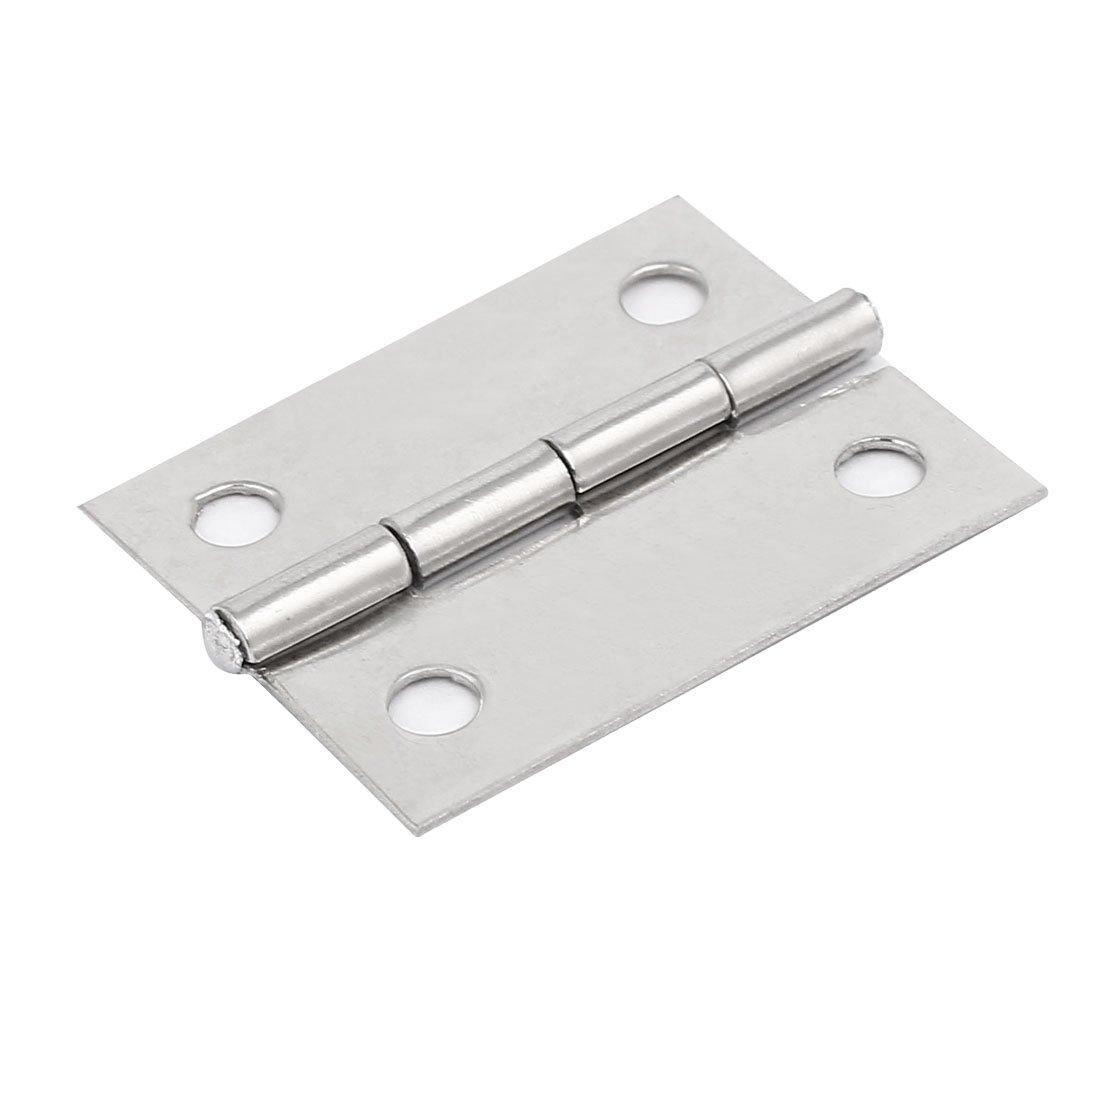 uxcell Cabinet Wardrobe Door 1.5-inch Length Stainless Steel Screw Fixing Hinge